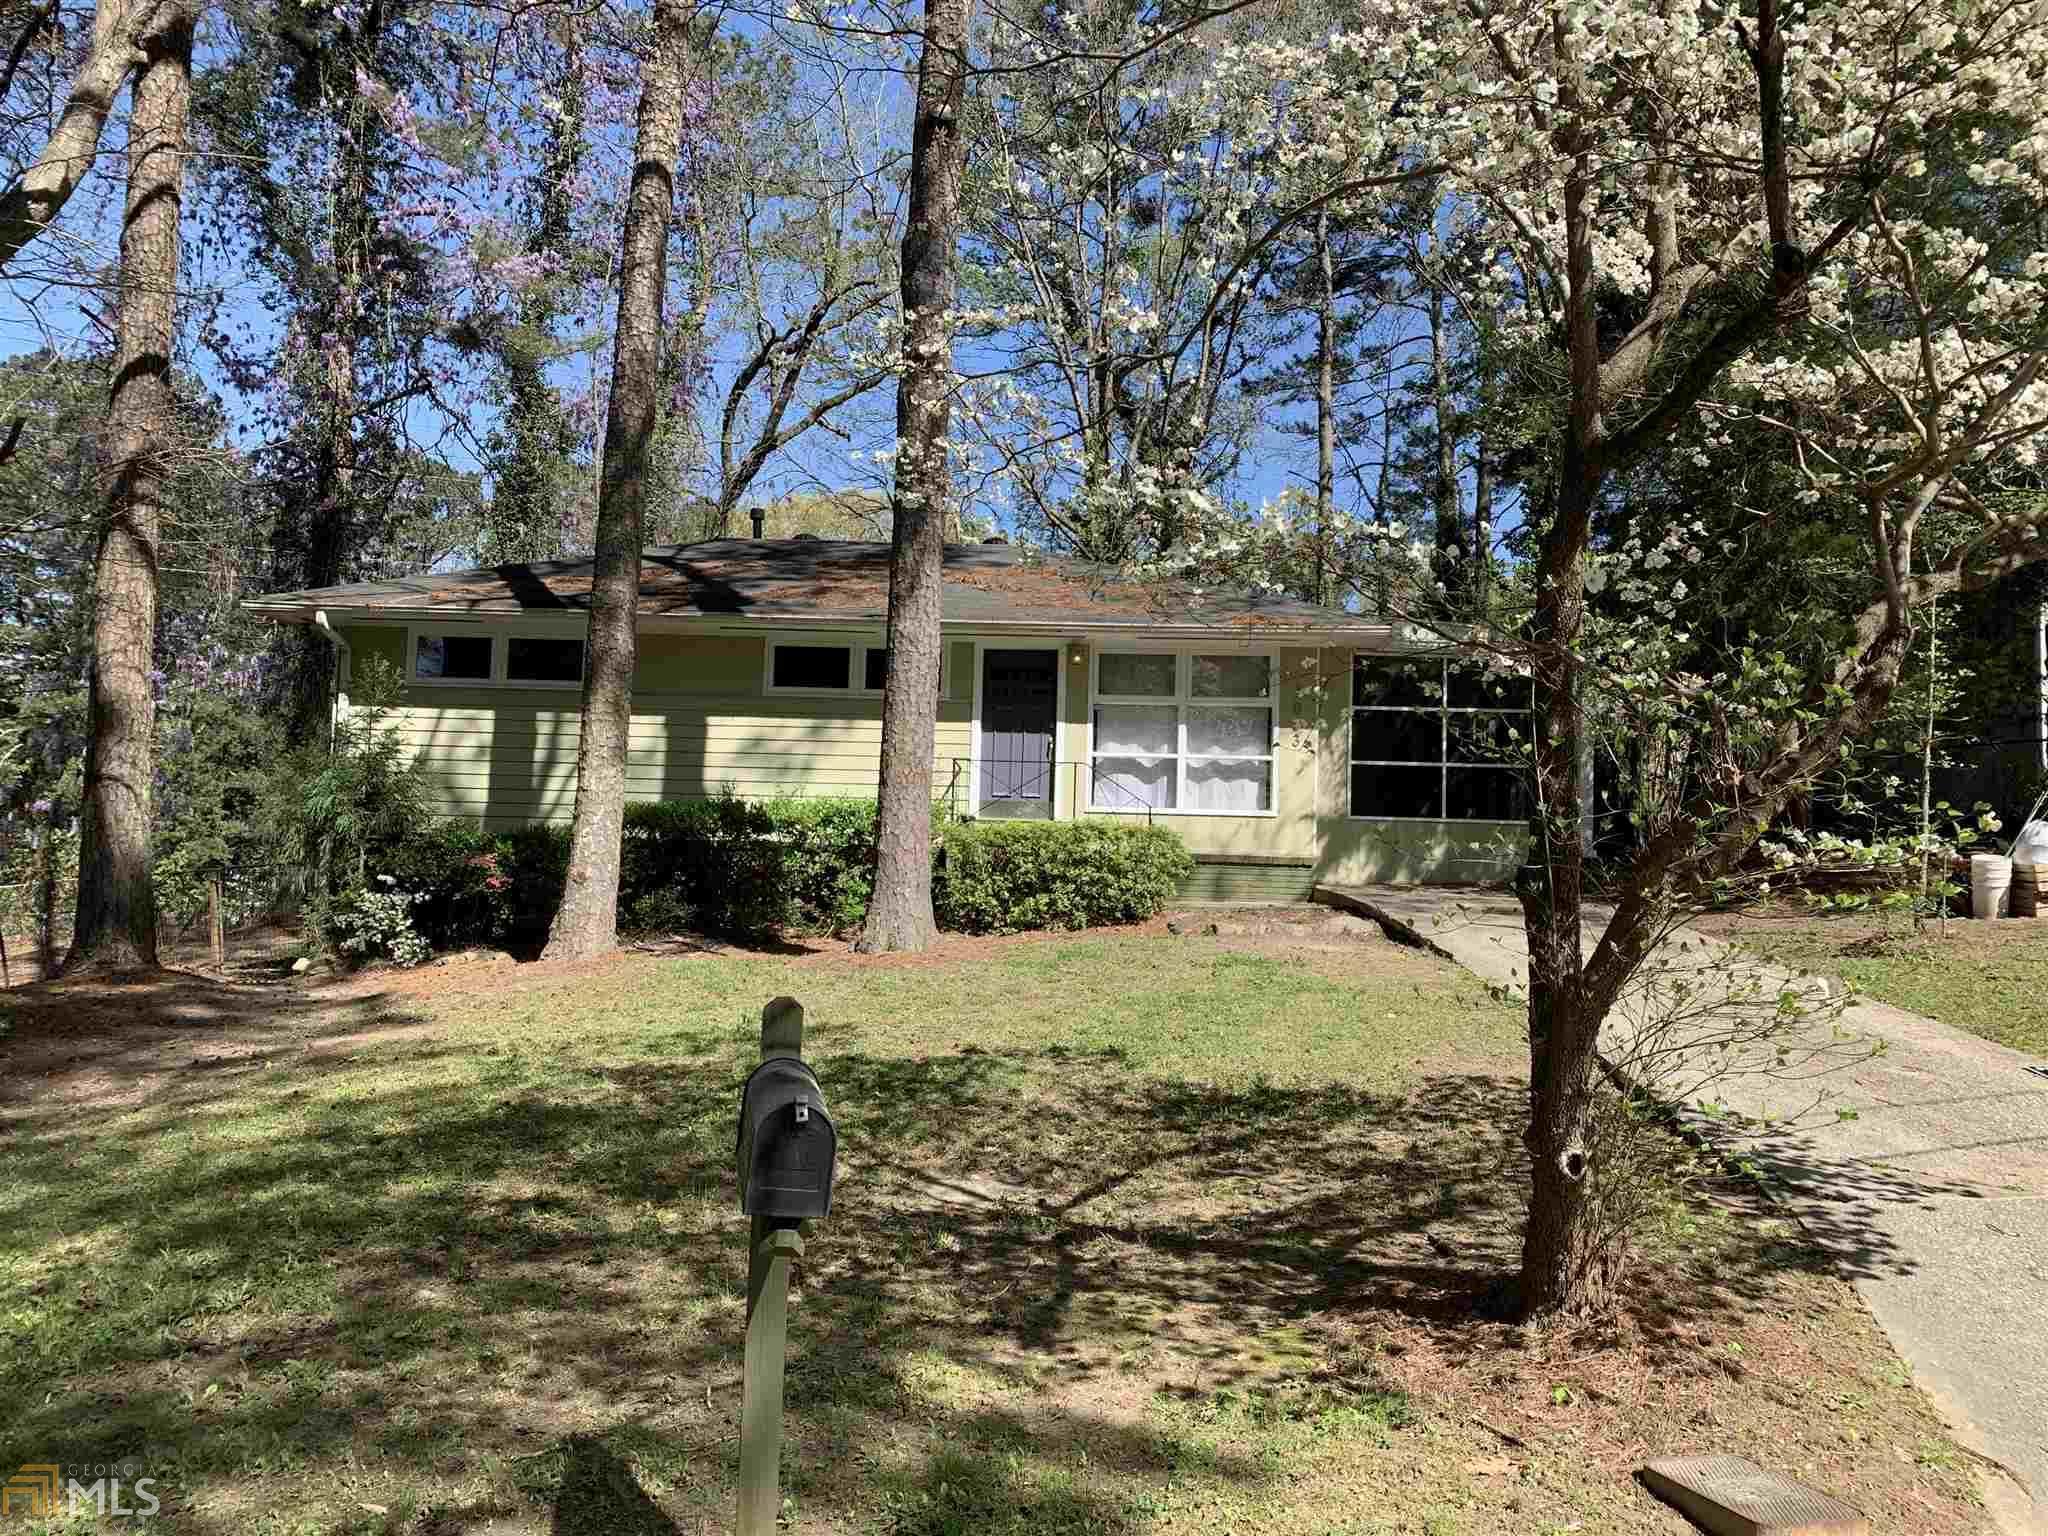 3063 Mckenzie Dr, East Point, Georgia 30344, 3 Bedrooms Bedrooms, ,1 BathroomBathrooms,Single Family,For Sale,3063 Mckenzie Dr,1,8953242